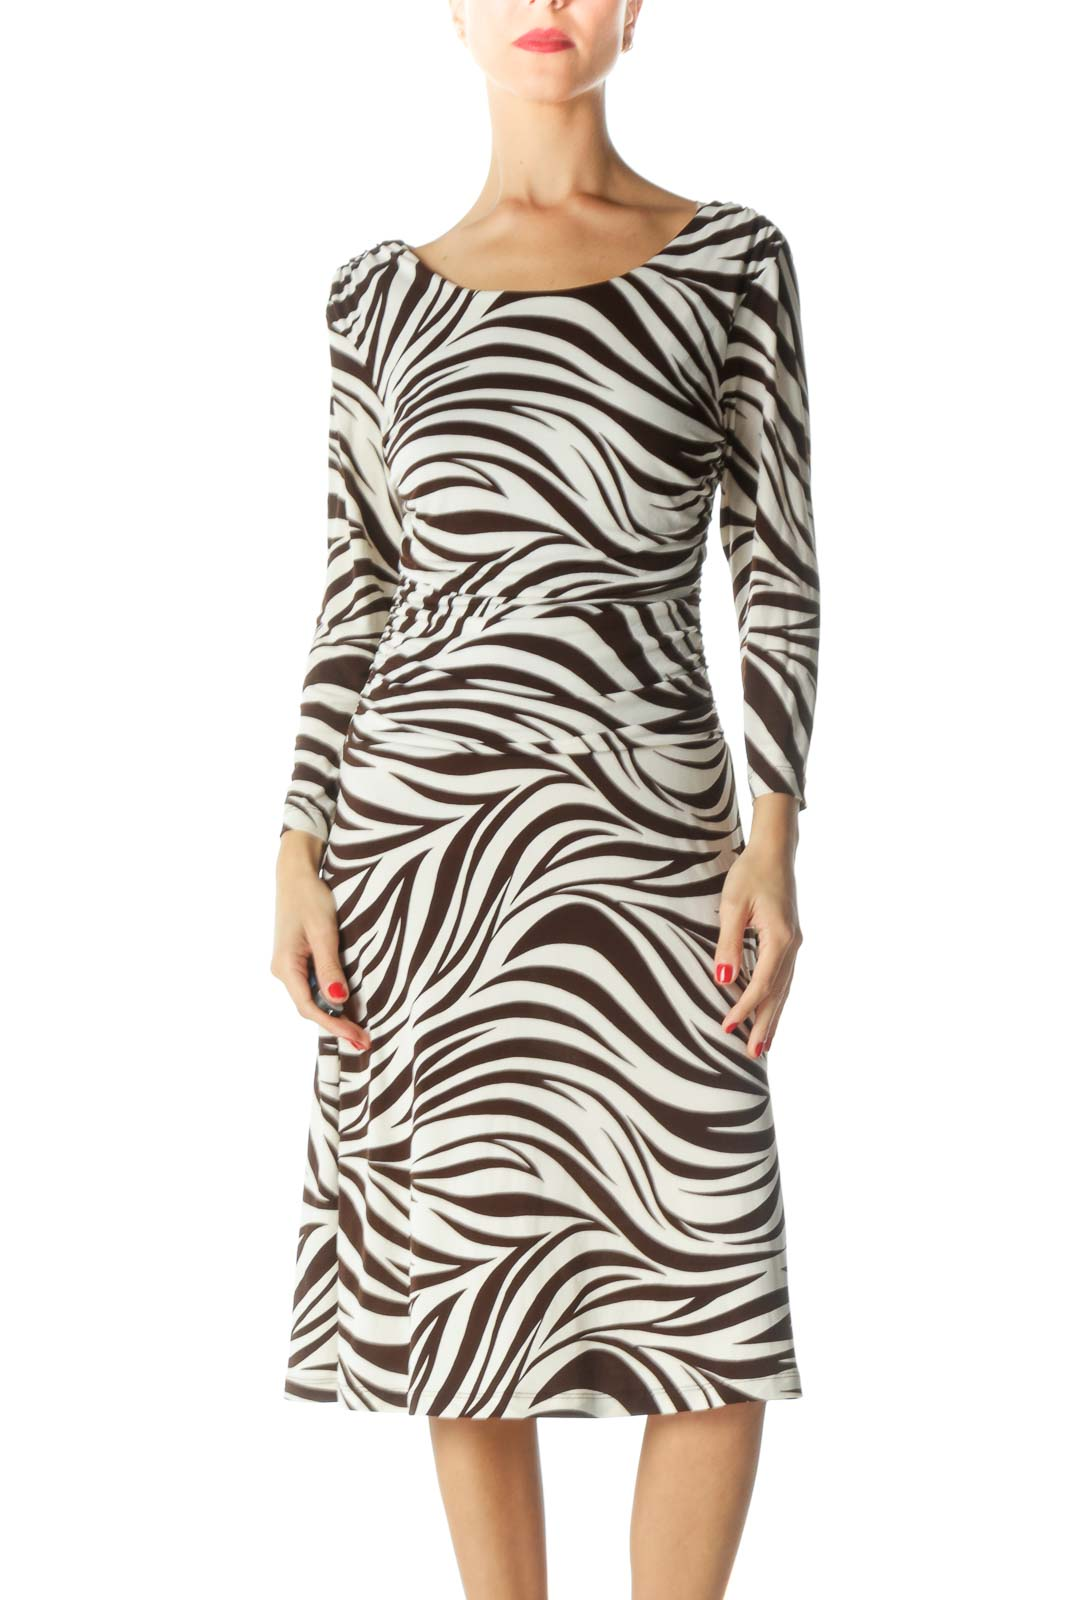 Brown Cream Boat Neck Zebra Print Dress Front